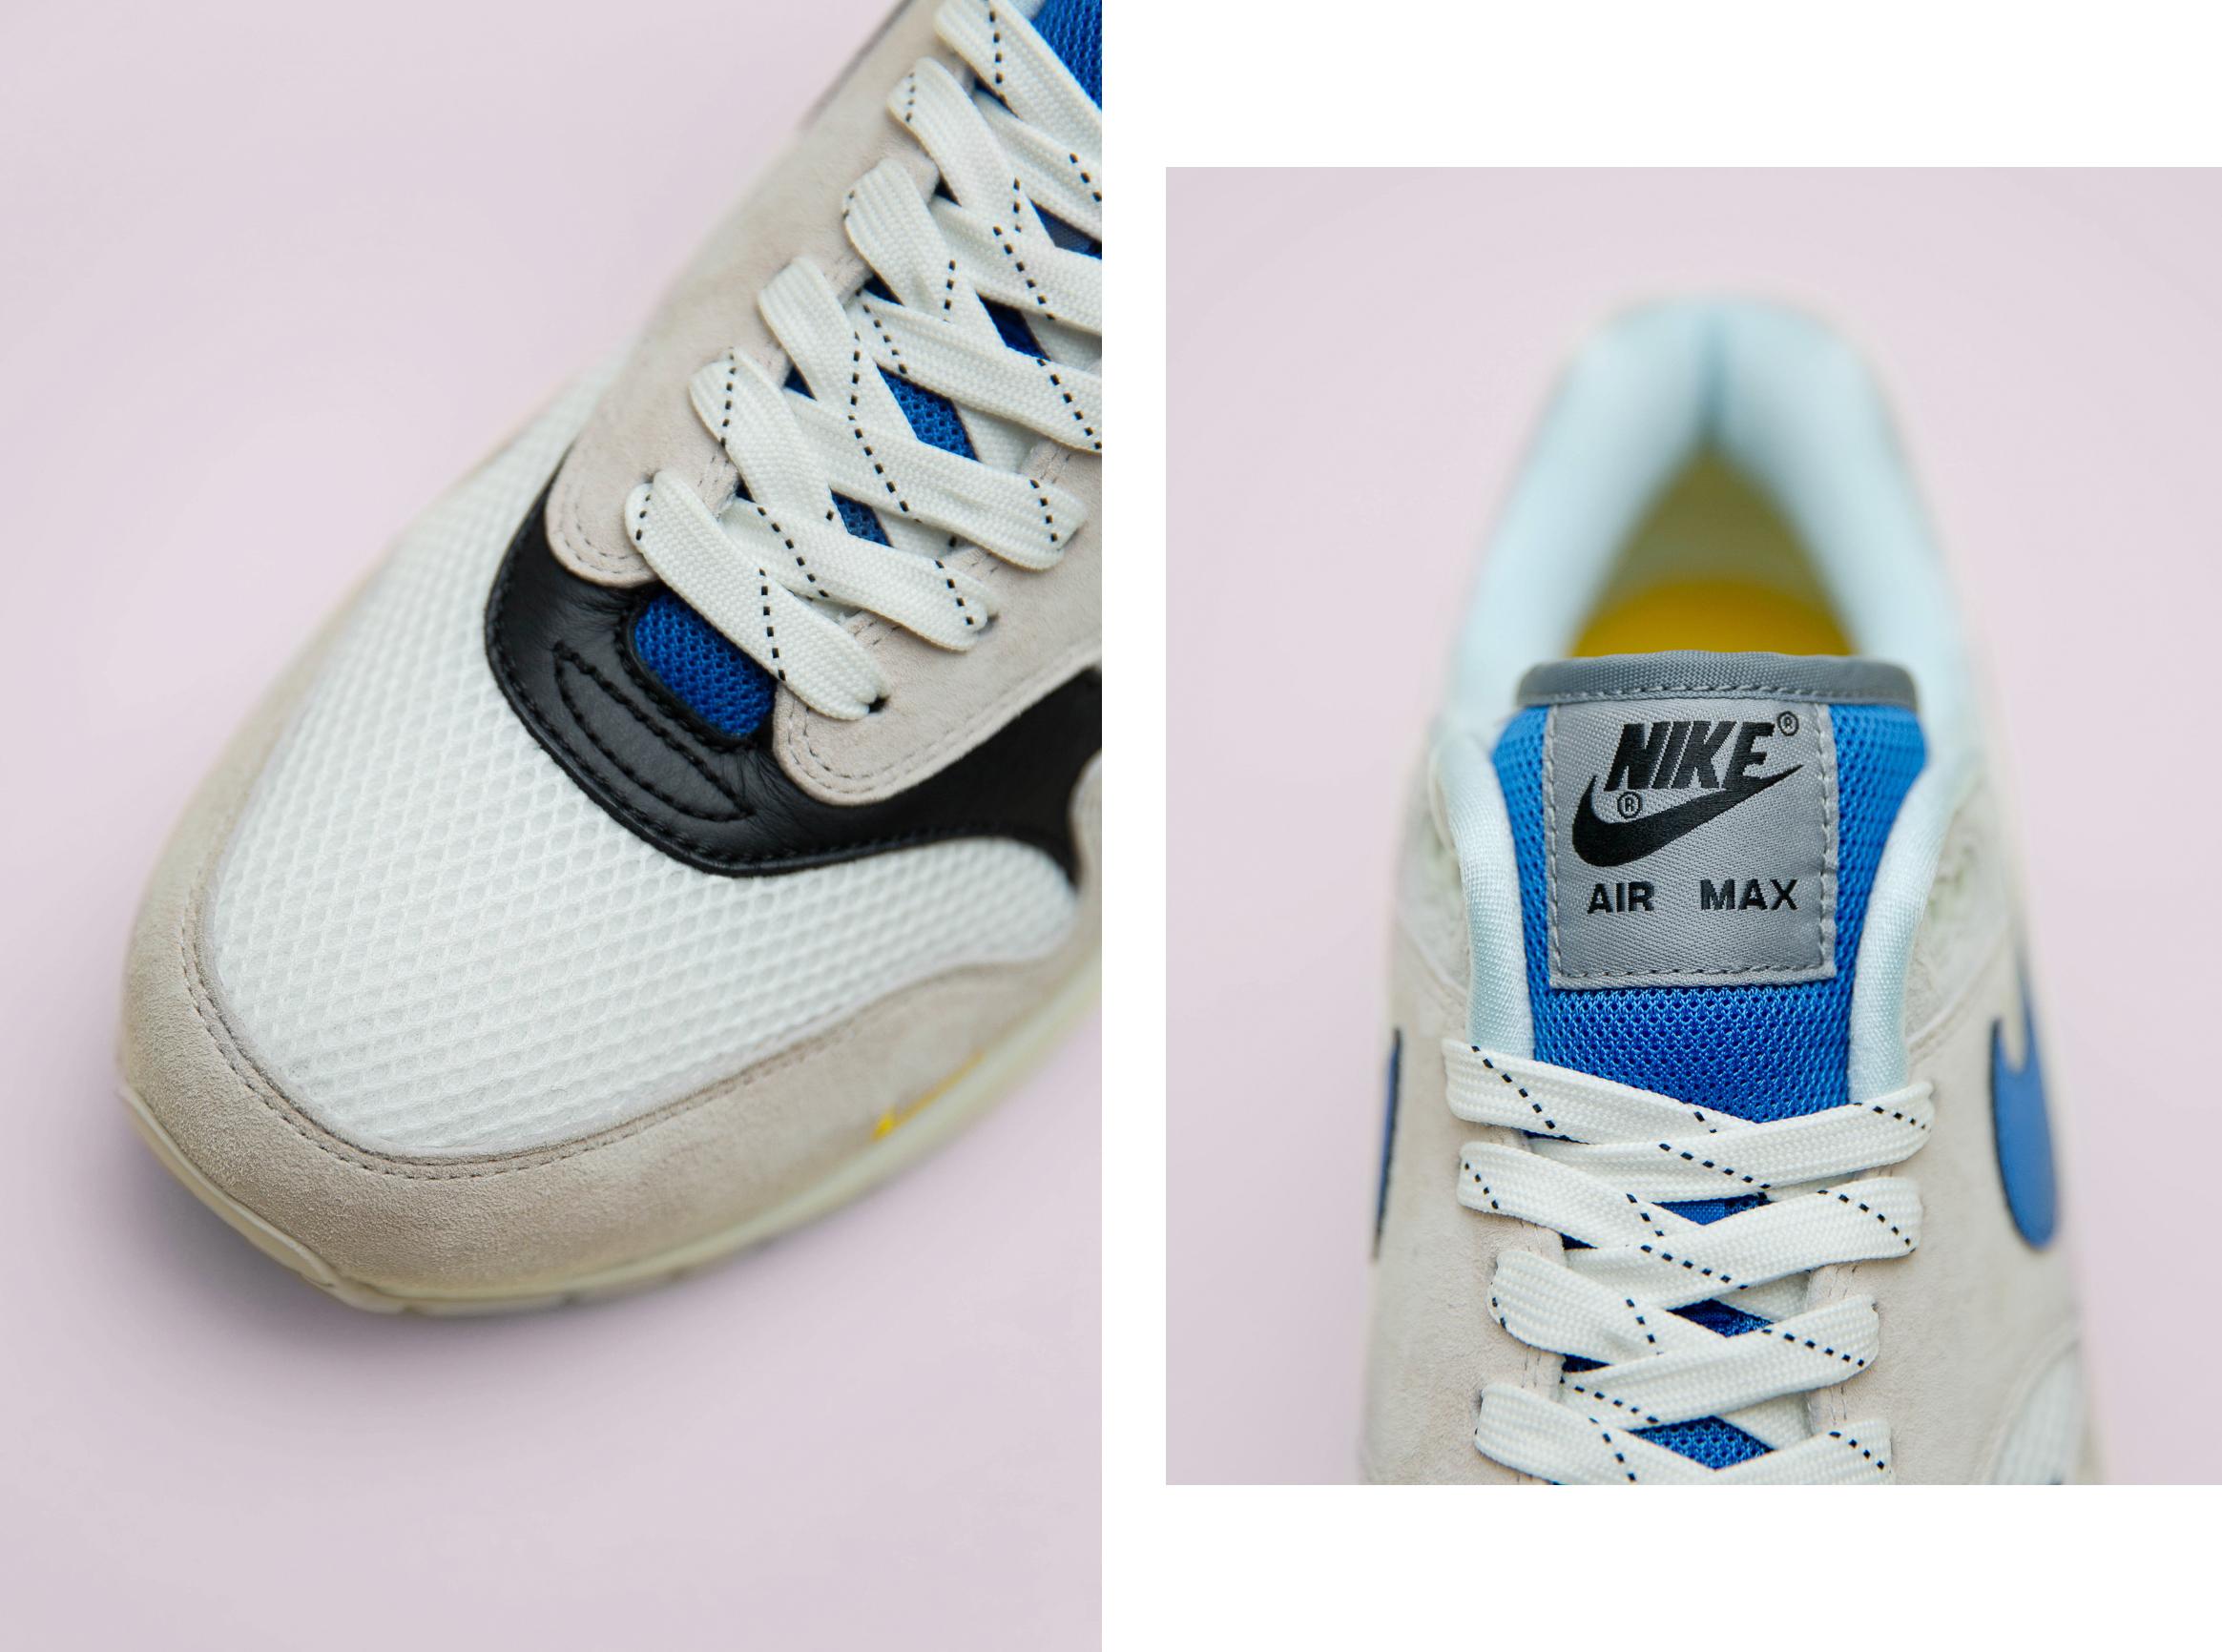 DSTNGR_Nike_Size?_duskdawn_7